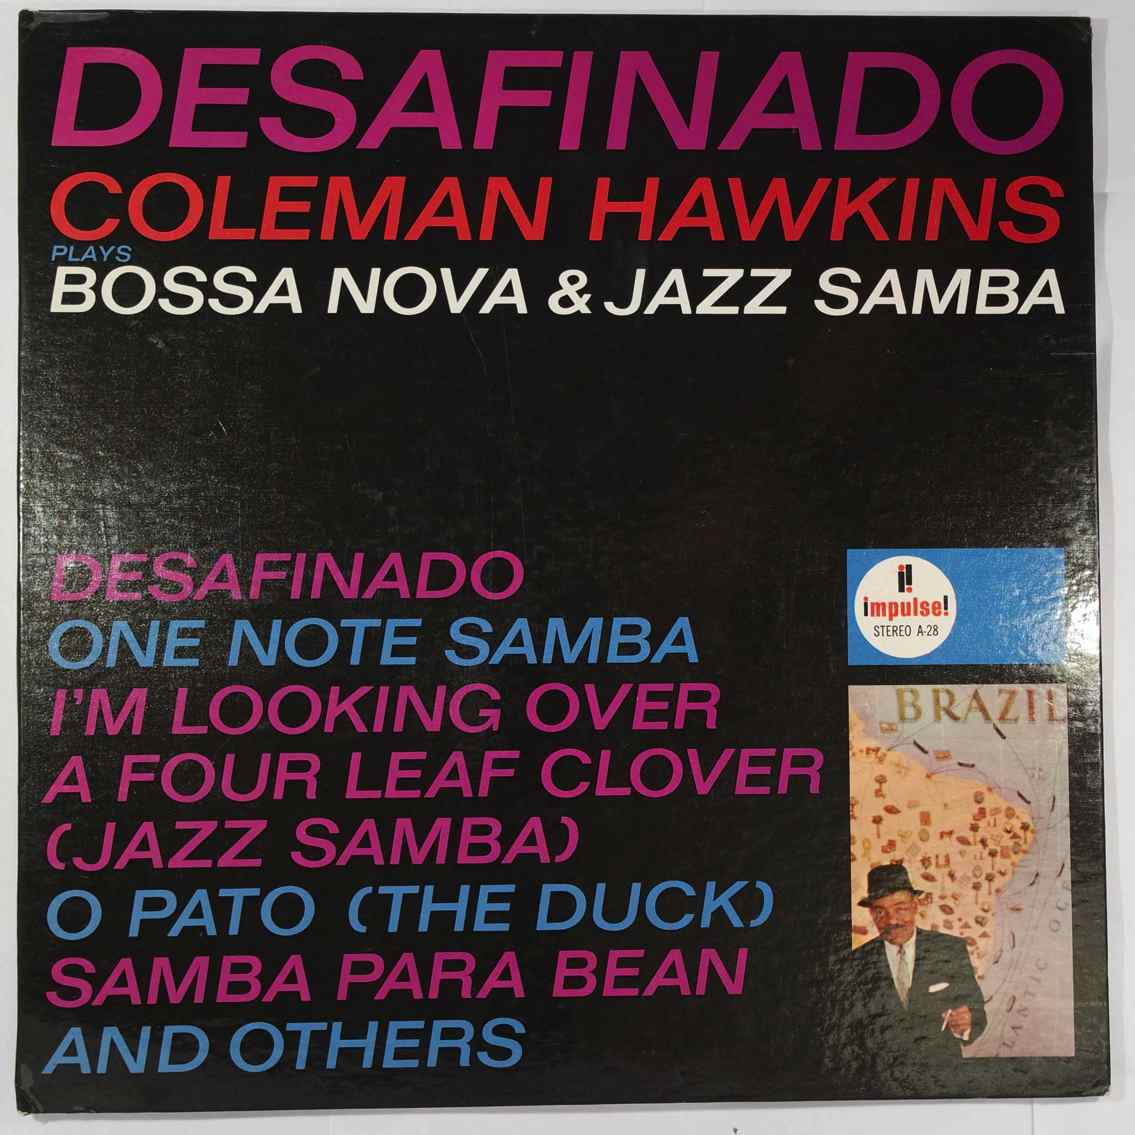 COLEMAN HAWKINS - Desafinado (Coleman Hawkins Plays Bossa Nova & Jazz Samba) - LP